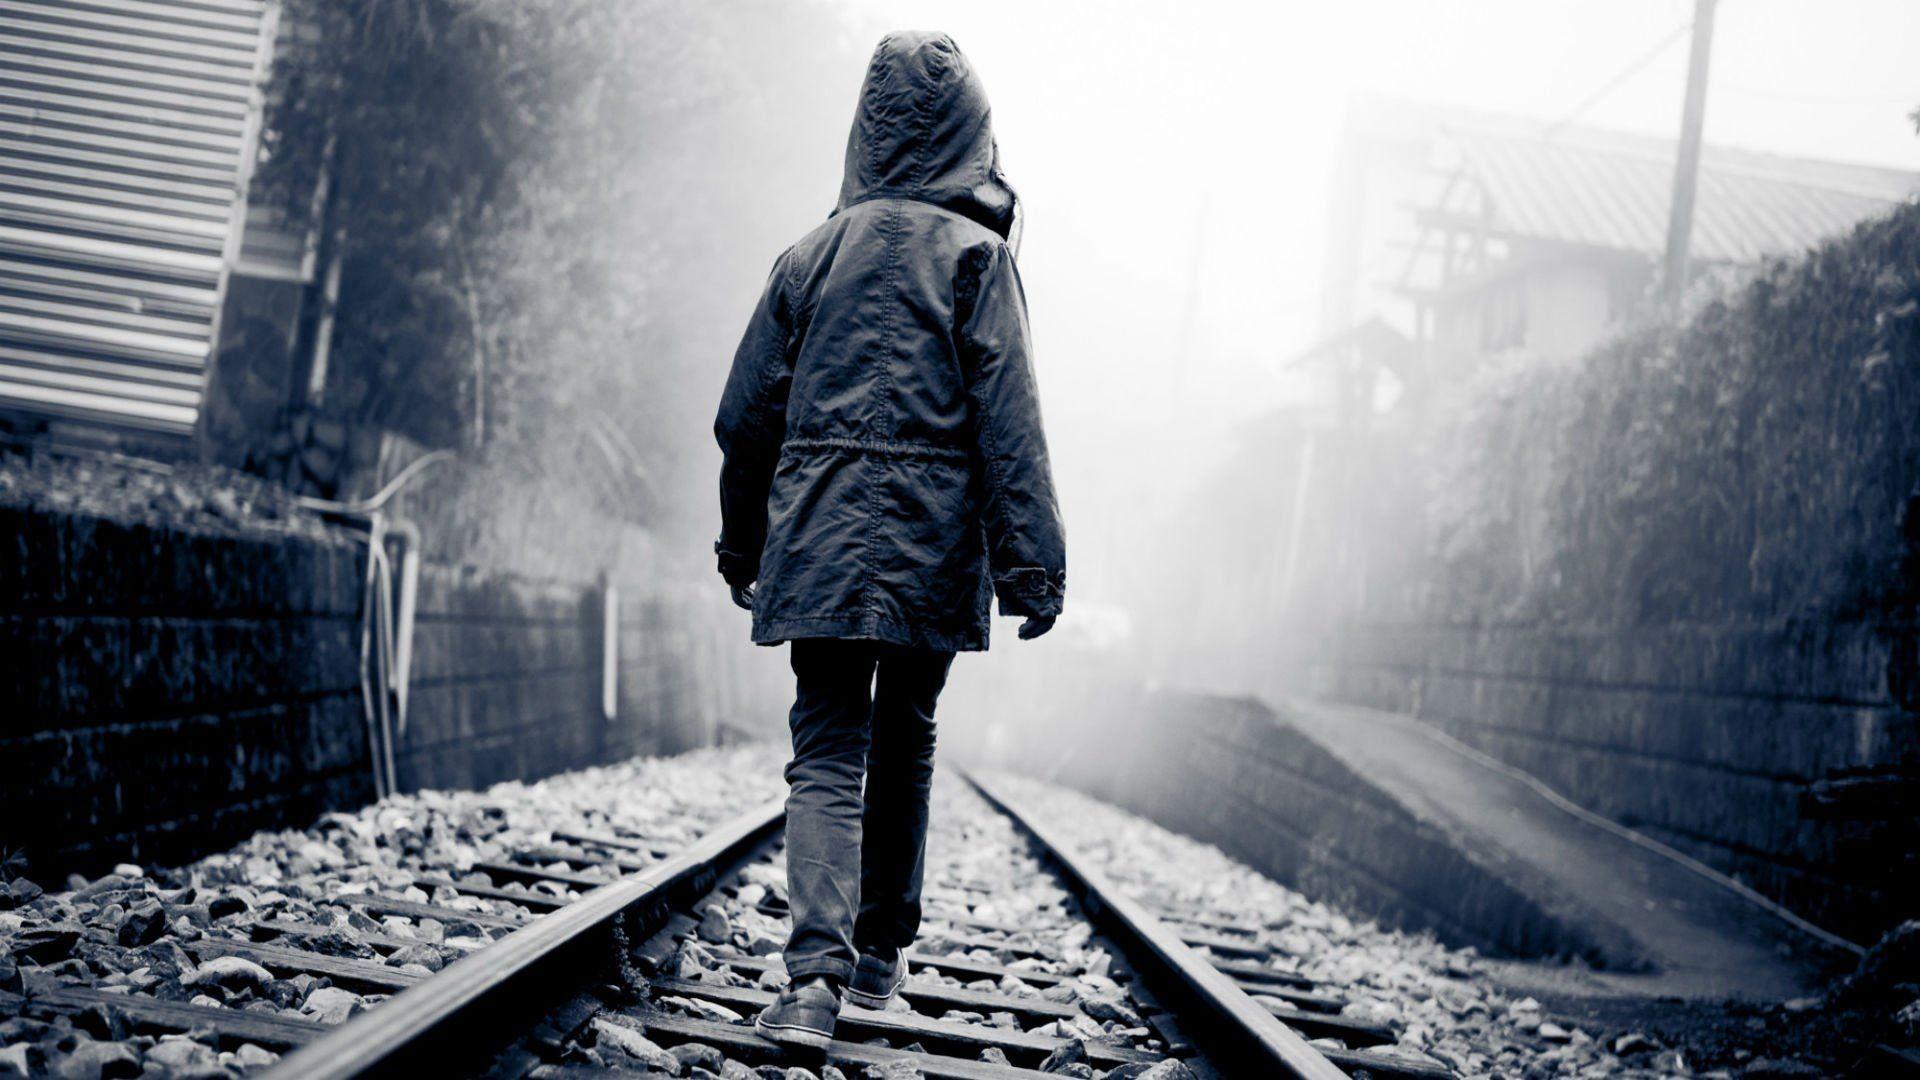 alone boy hd wallpaper,transport,atmospheric phenomenon,standing,track,black and white